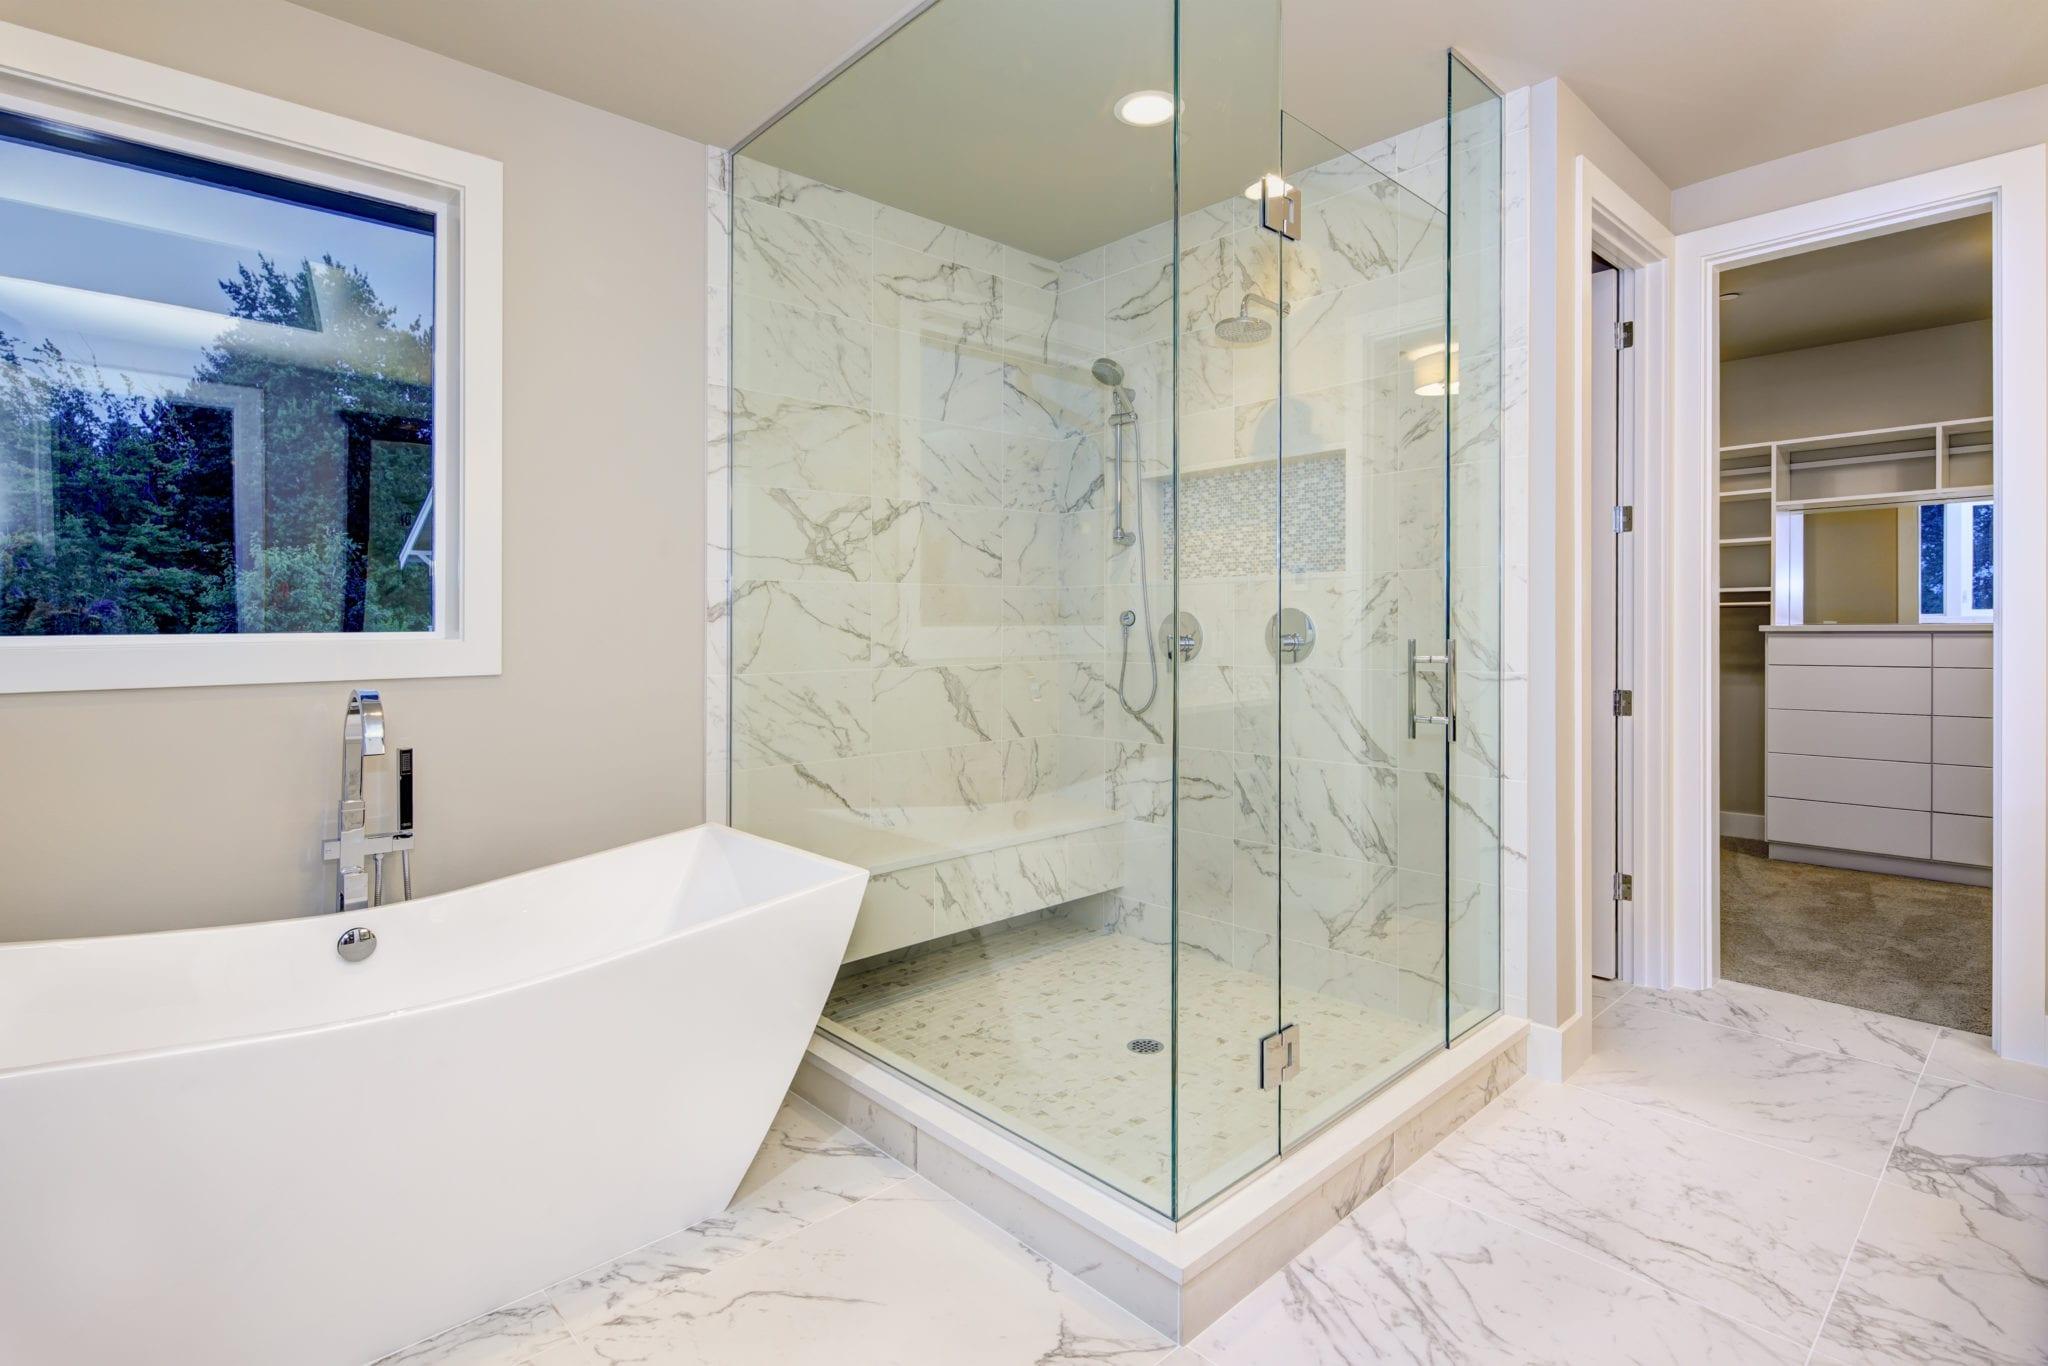 walk-in shower stall